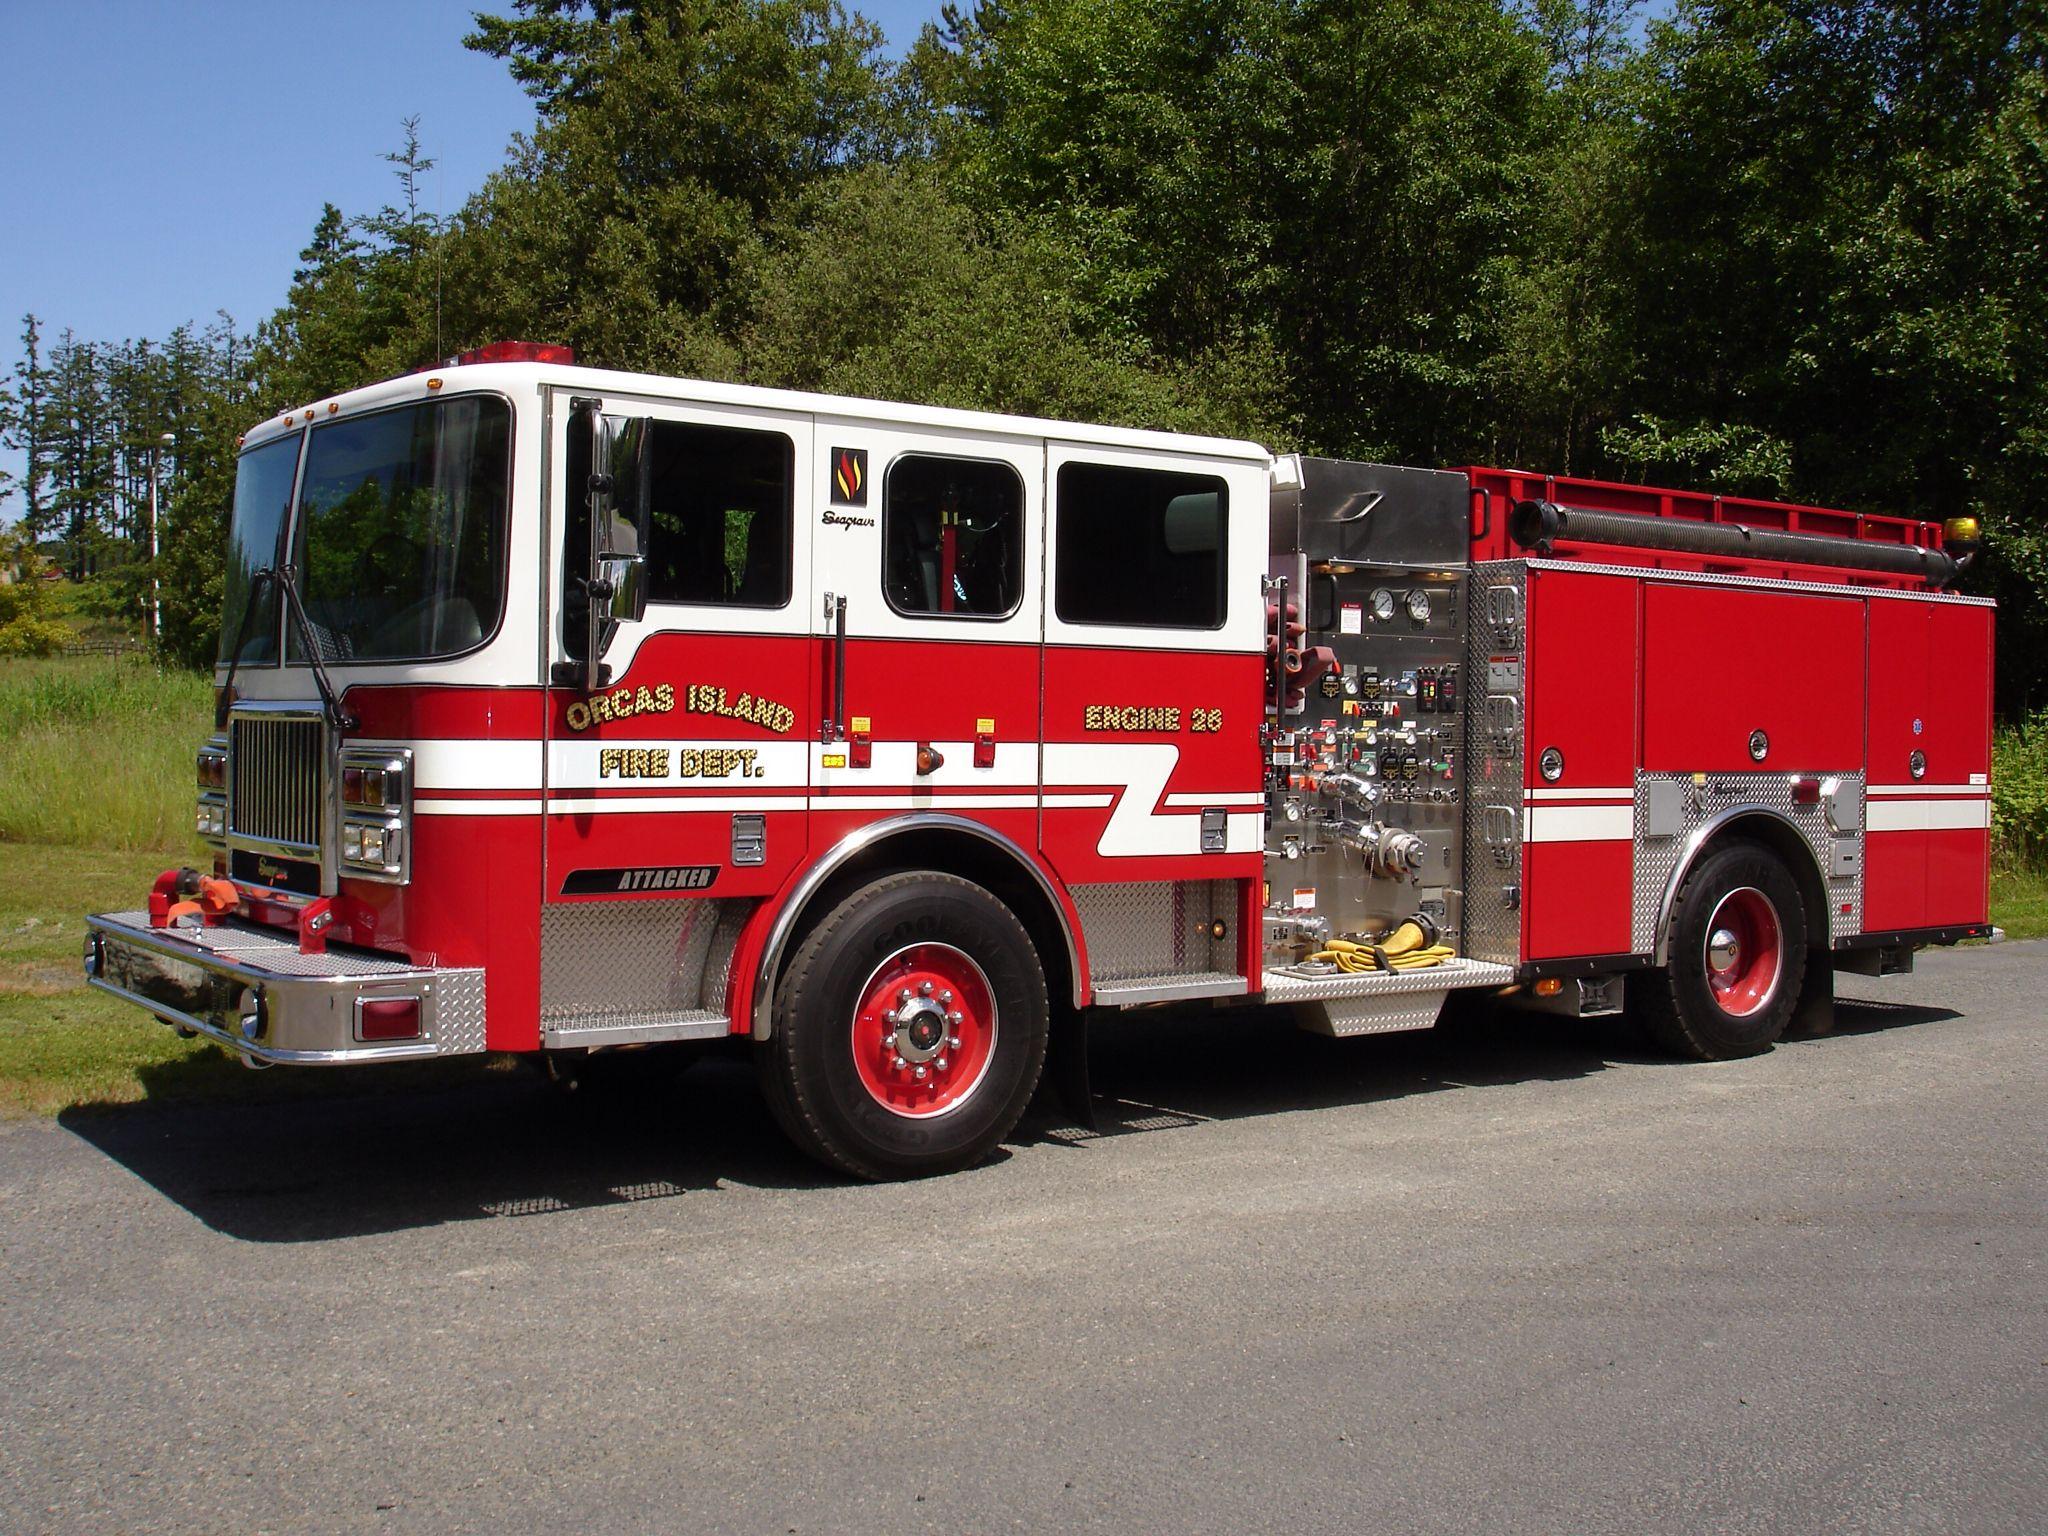 orcas island fire rescue engine 26 2004 seagrave attacker 1250 1000  [ 2048 x 1536 Pixel ]